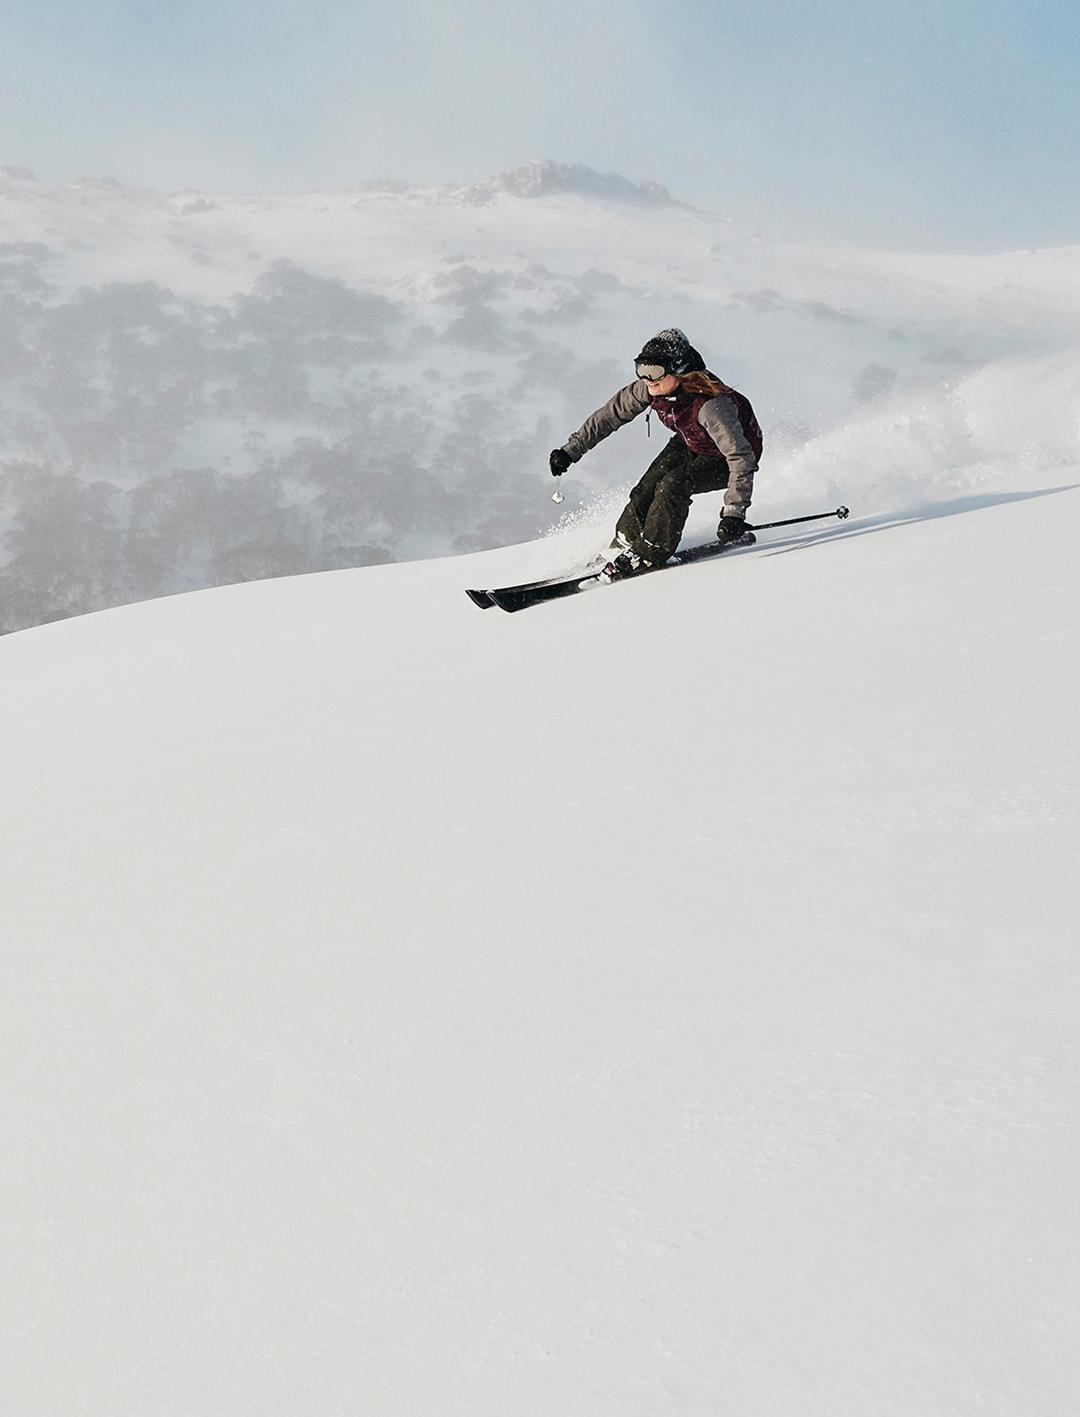 person skiing down snowy mountain